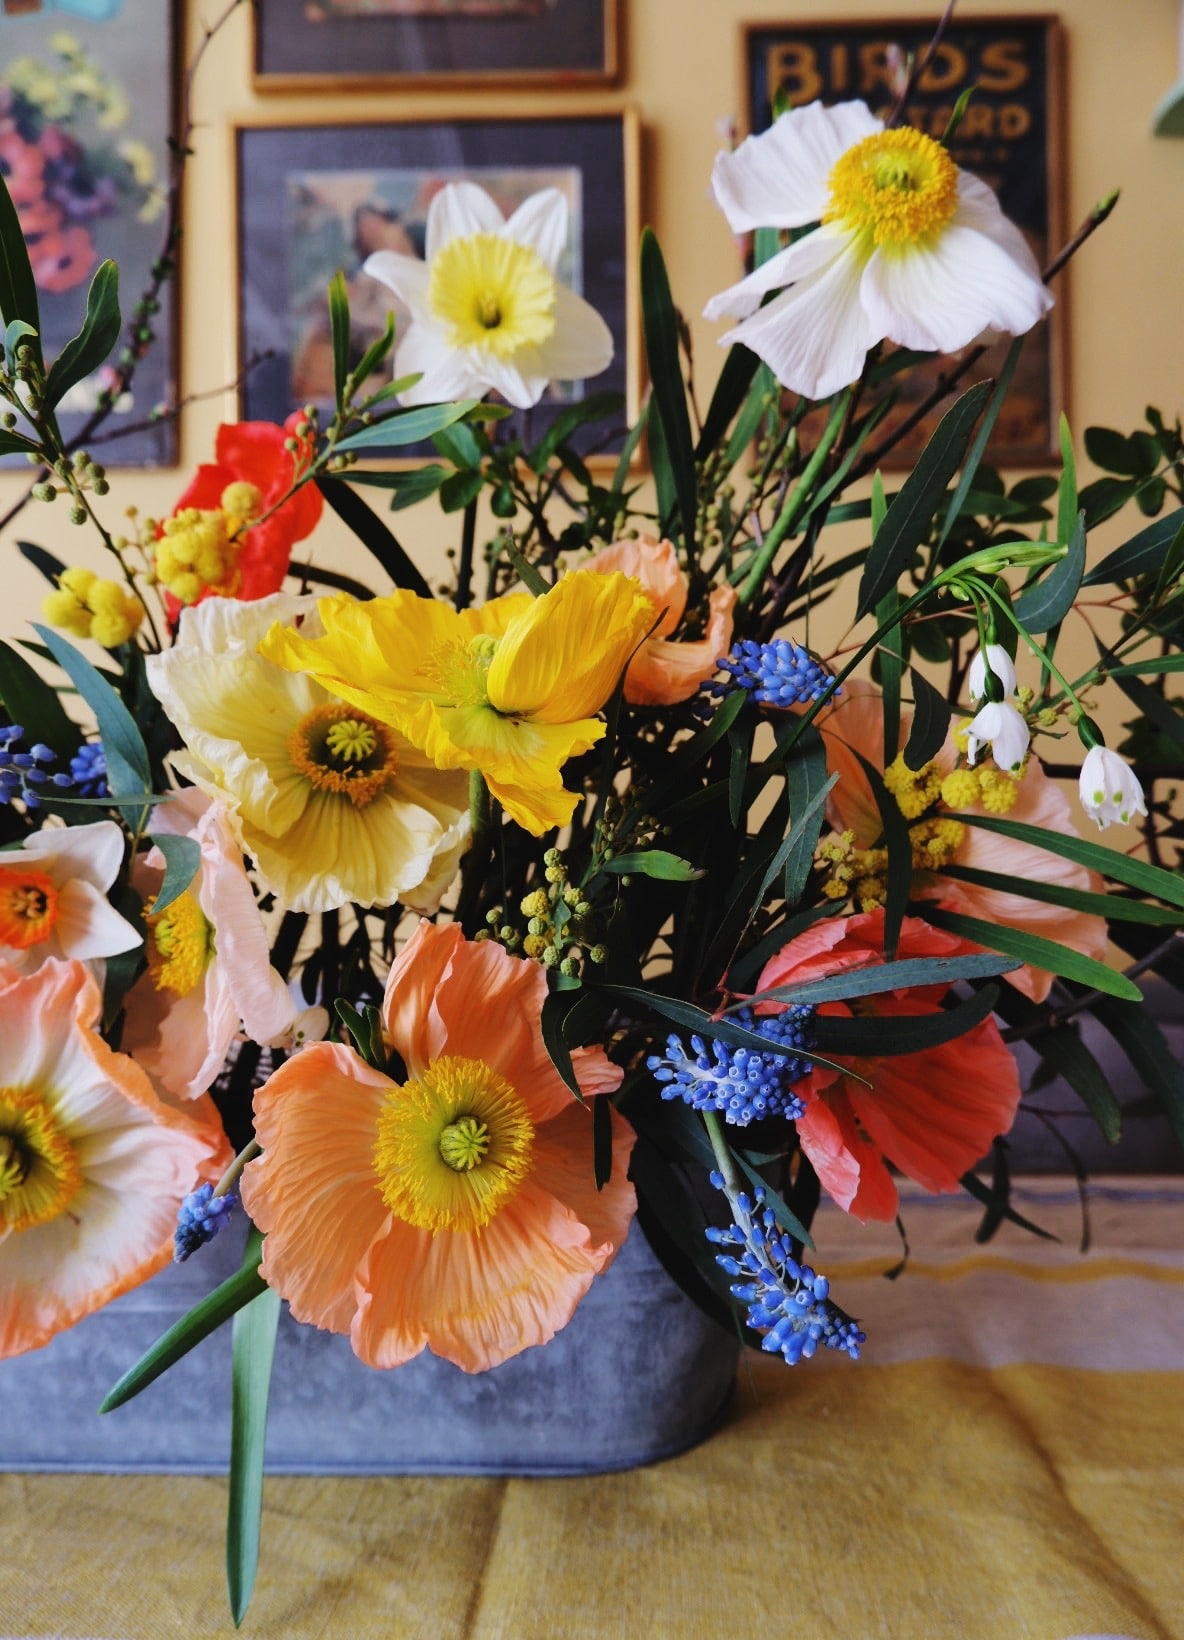 Flower Meadow Workshop and Afternoon Tea